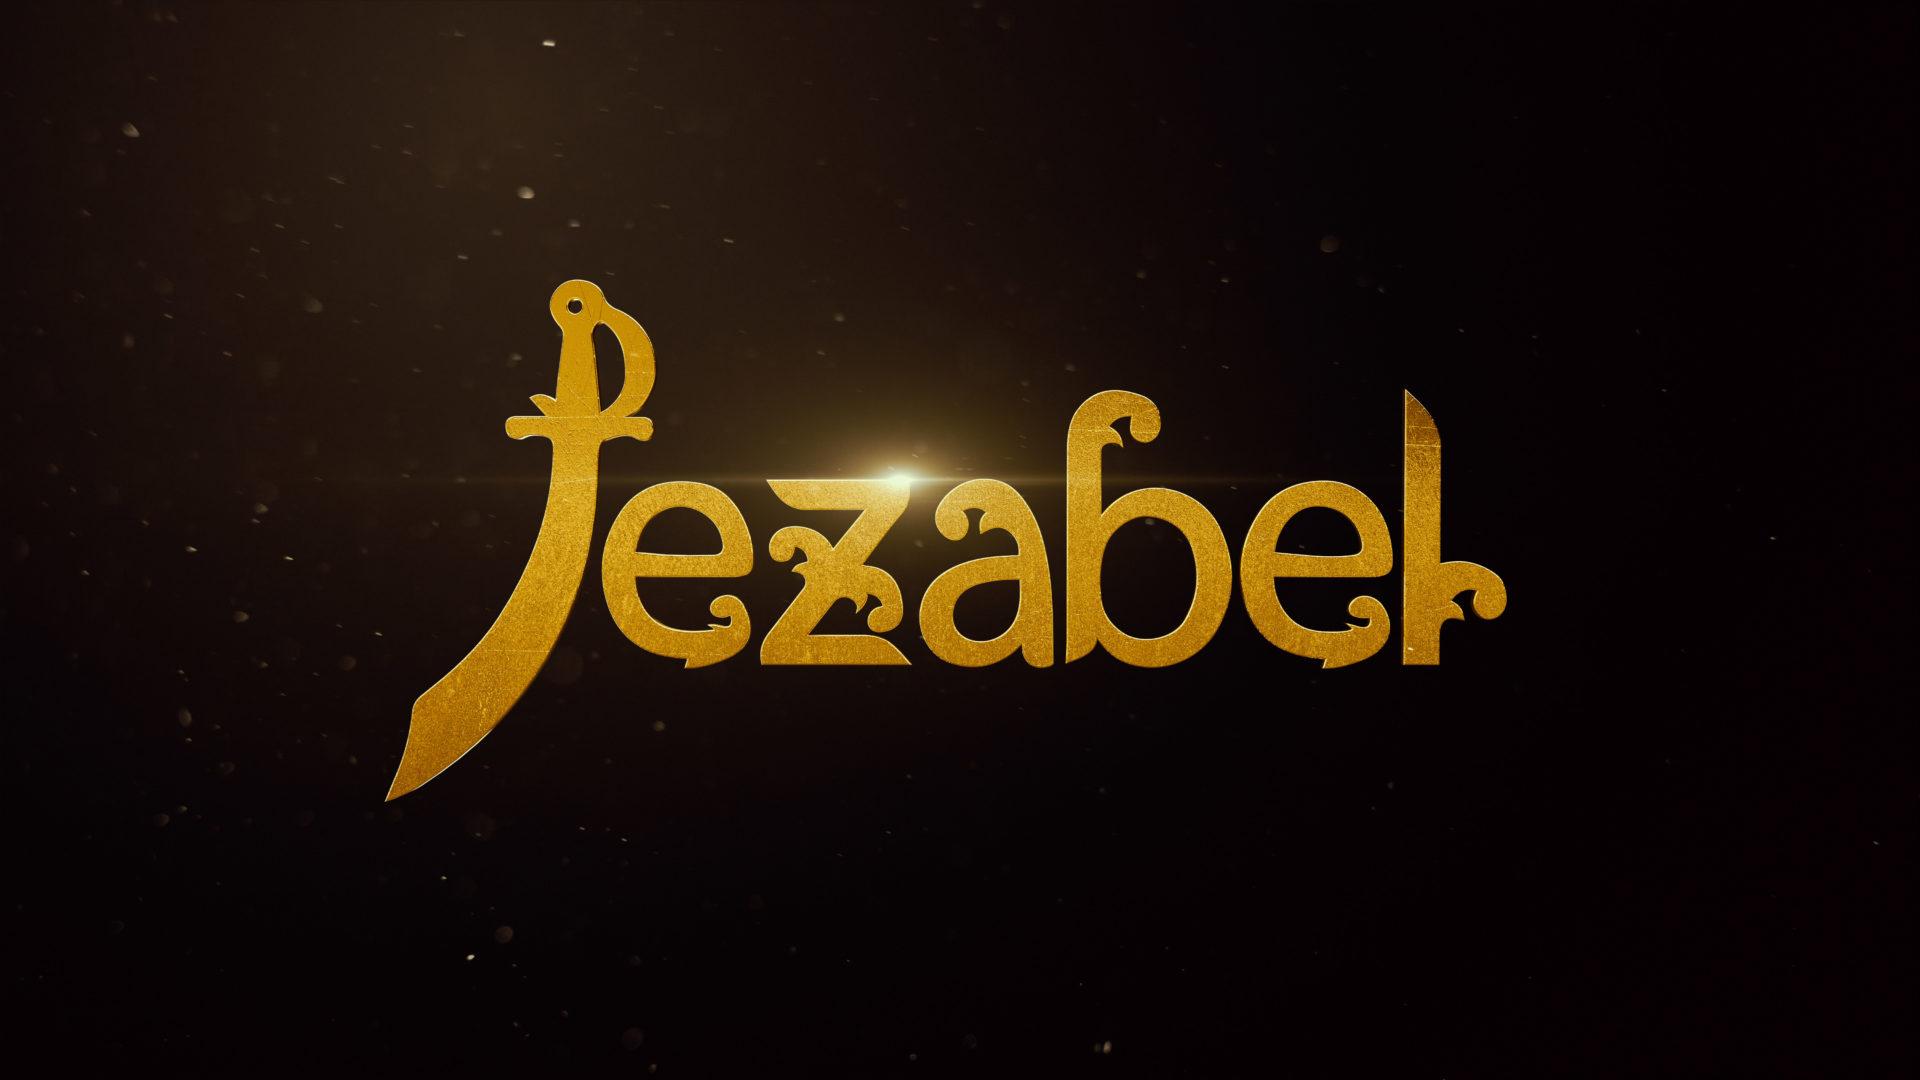 Jezabel a nova macrossérie bíblica da Record TV